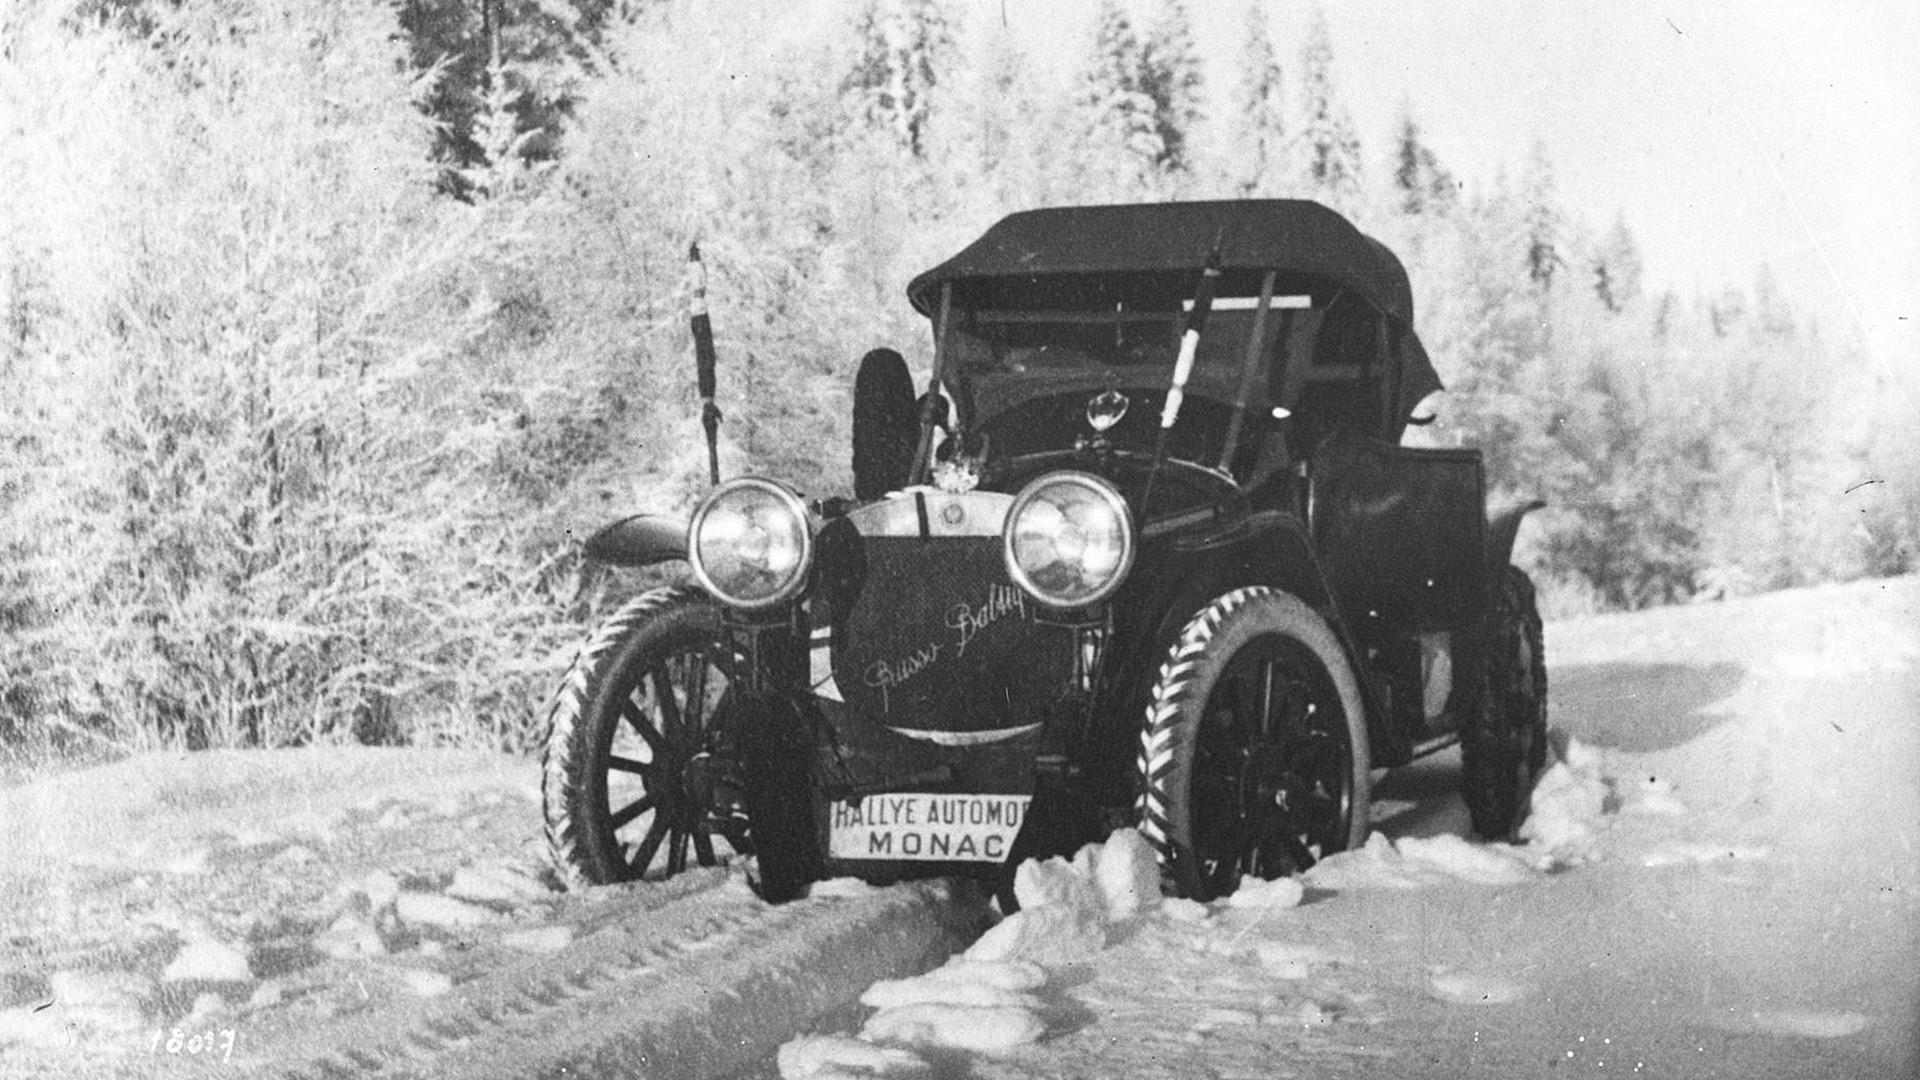 La voiture Russo-Balt de Nagel lors du rallye de Monte-Carlo en 1912